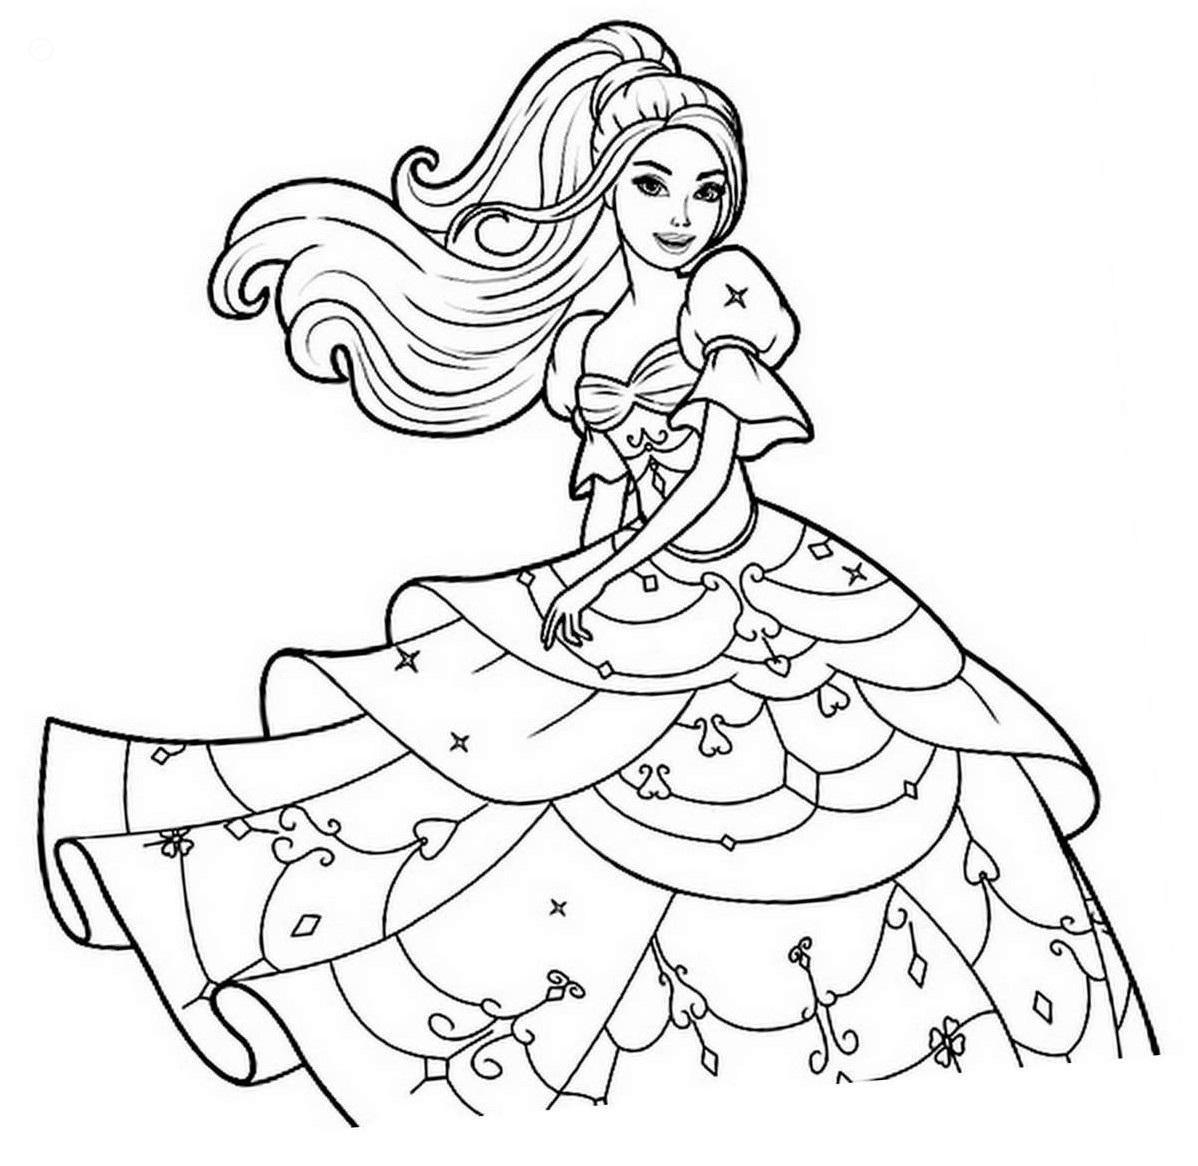 Dibujos De Hermoso Princesa Barbie Para Colorear Pintar E Imprimir